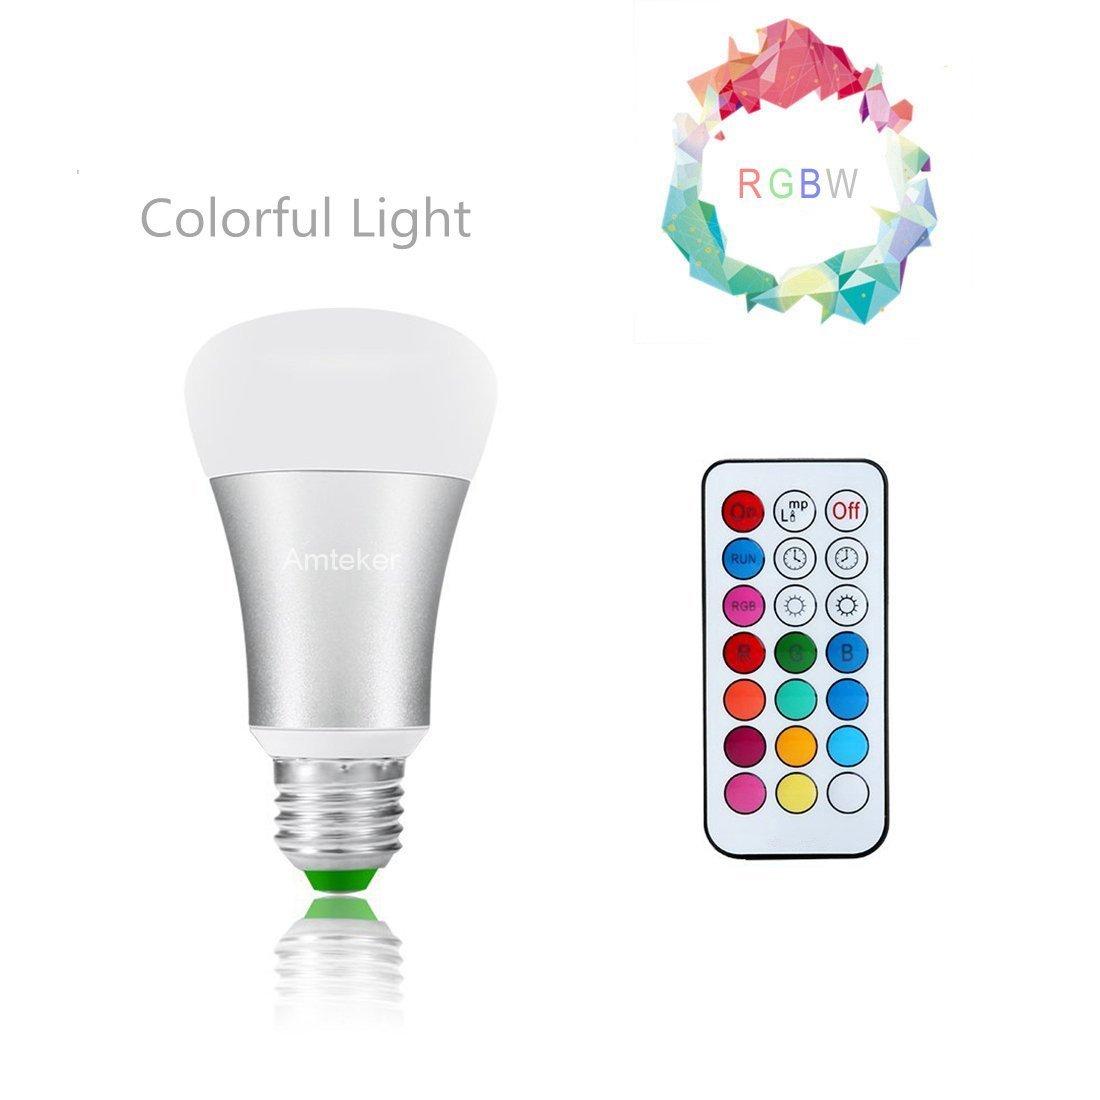 Amteker LED RGB Bulb E27 10W Remote Control LED Light Bulb RGBW 330 Degree LED Lamp Dimmable 85-265V with Remote Control